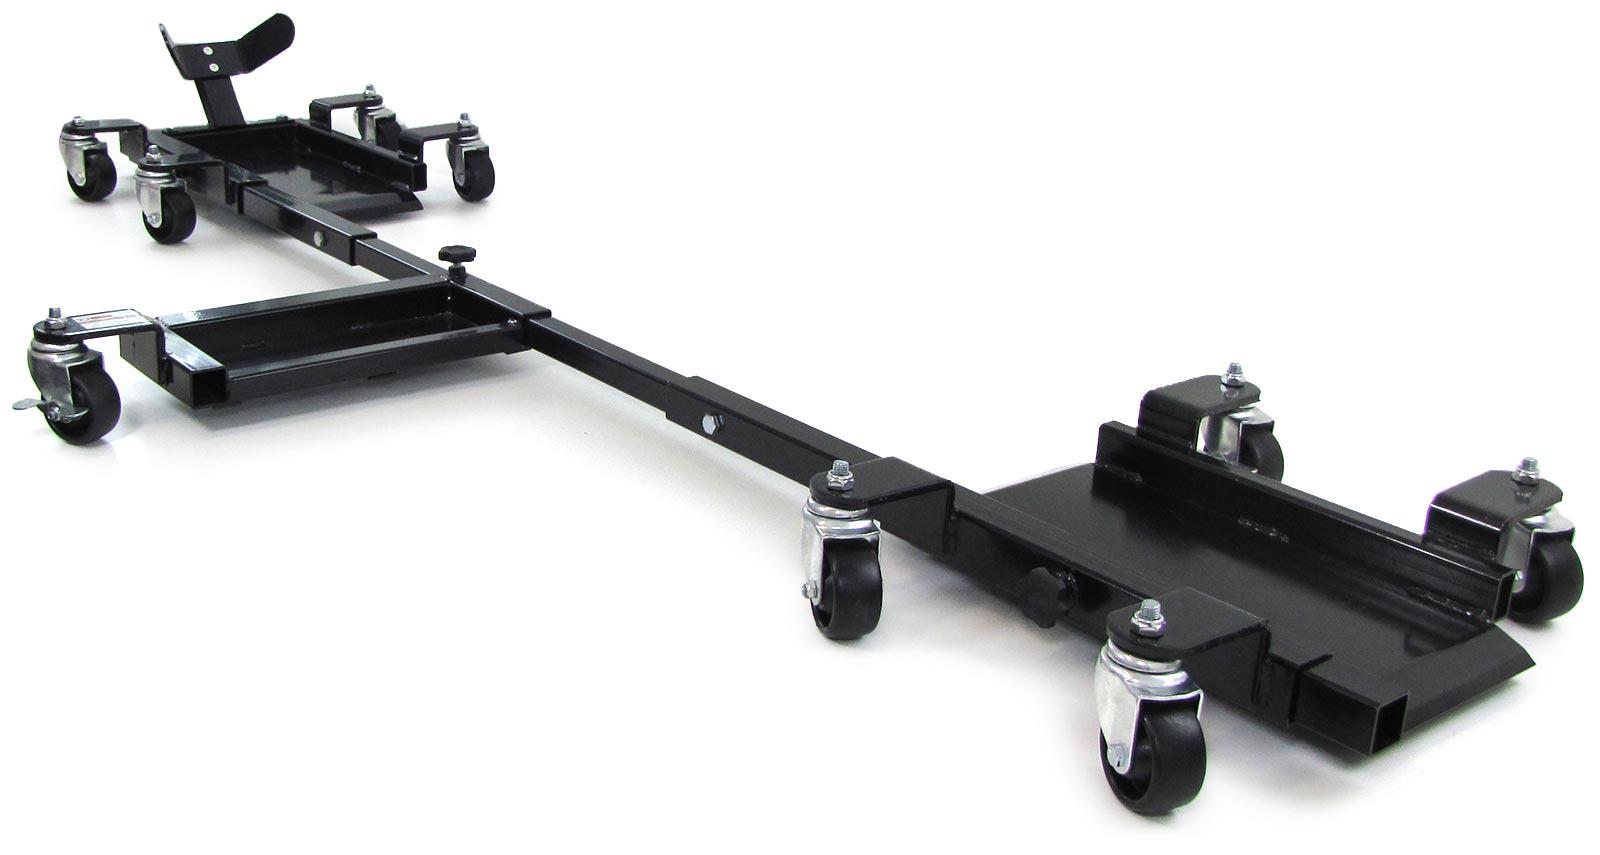 profi motorrad montage rangier st nder auch f r garage. Black Bedroom Furniture Sets. Home Design Ideas